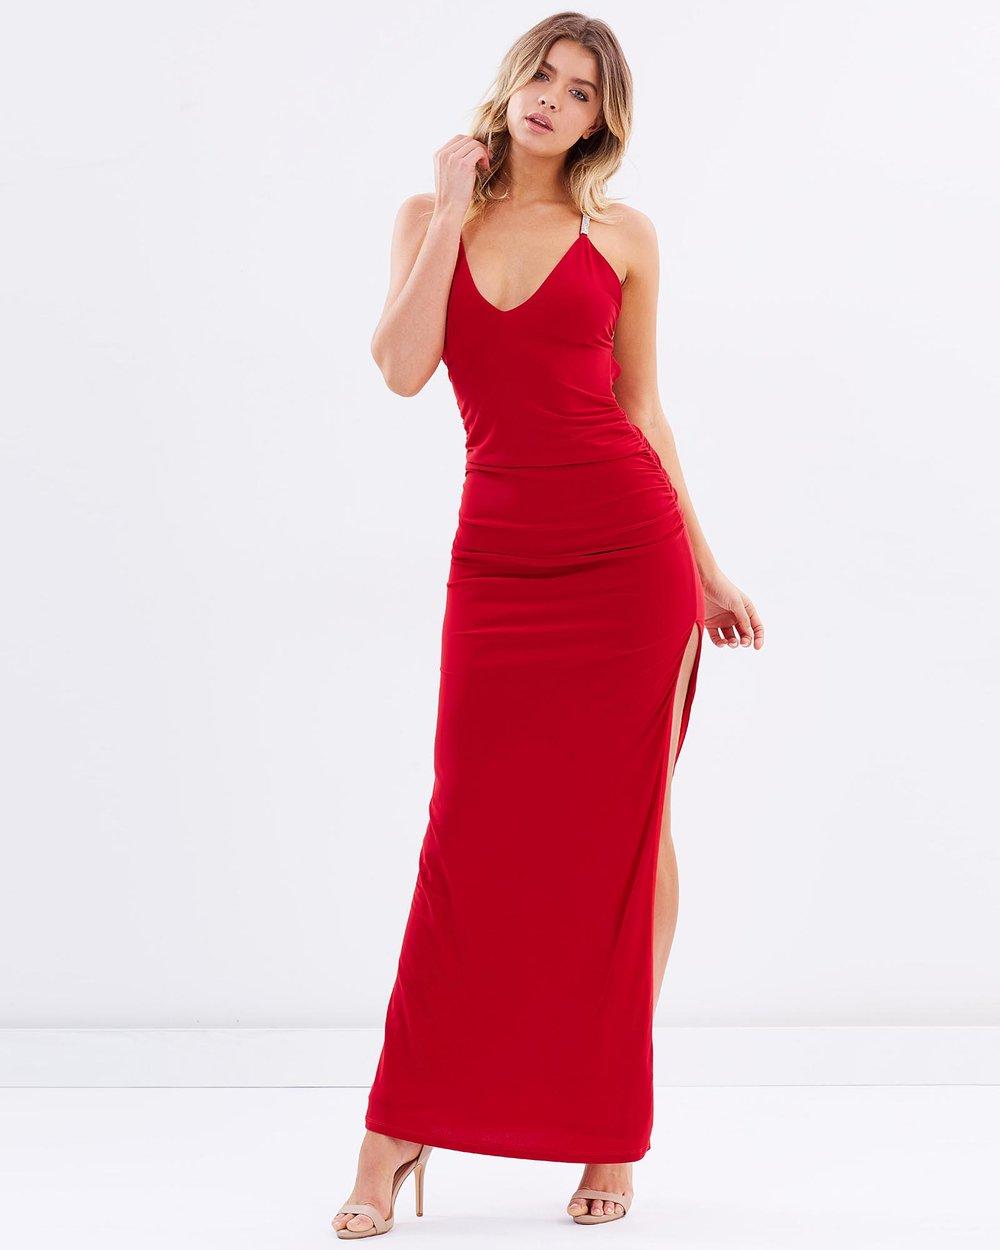 638412f439681 Cross Strap Evening Dress by SKIVA Online